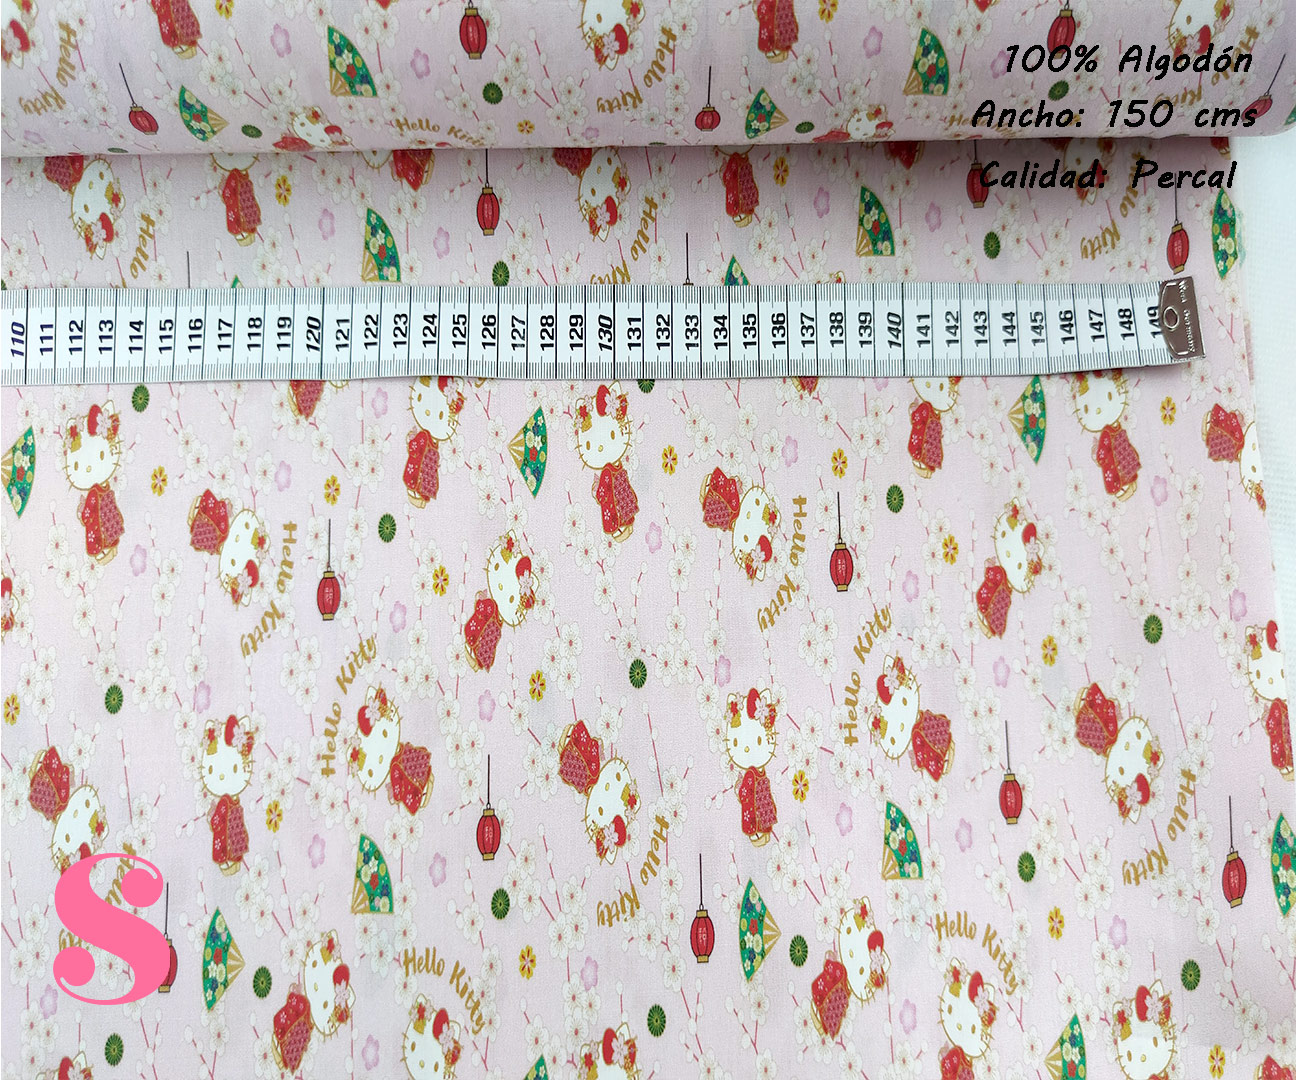 L77-hallo-kitty-geisha-friki-americano--tejidos-algodón-estampado-percal,Tejido Estampado Hello Kitty Geisha